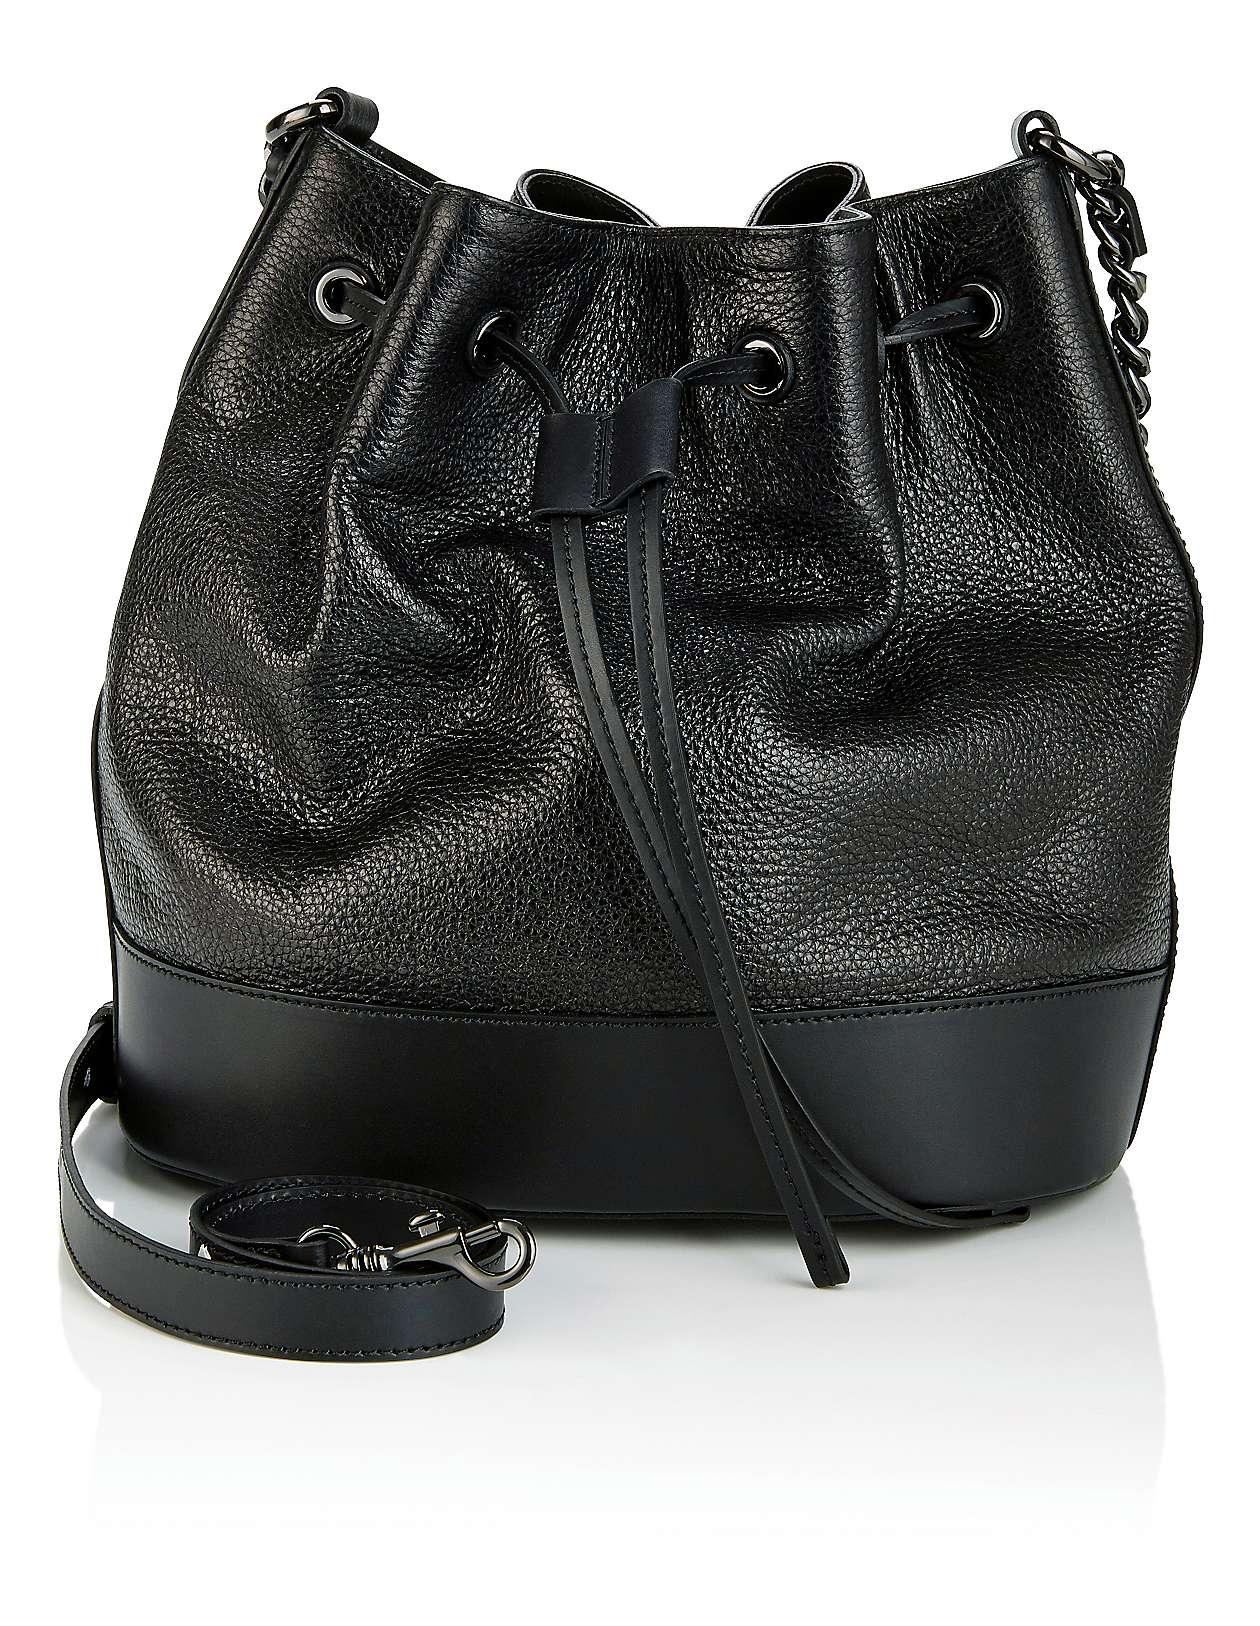 0c724390acaf4 Bags   handbags